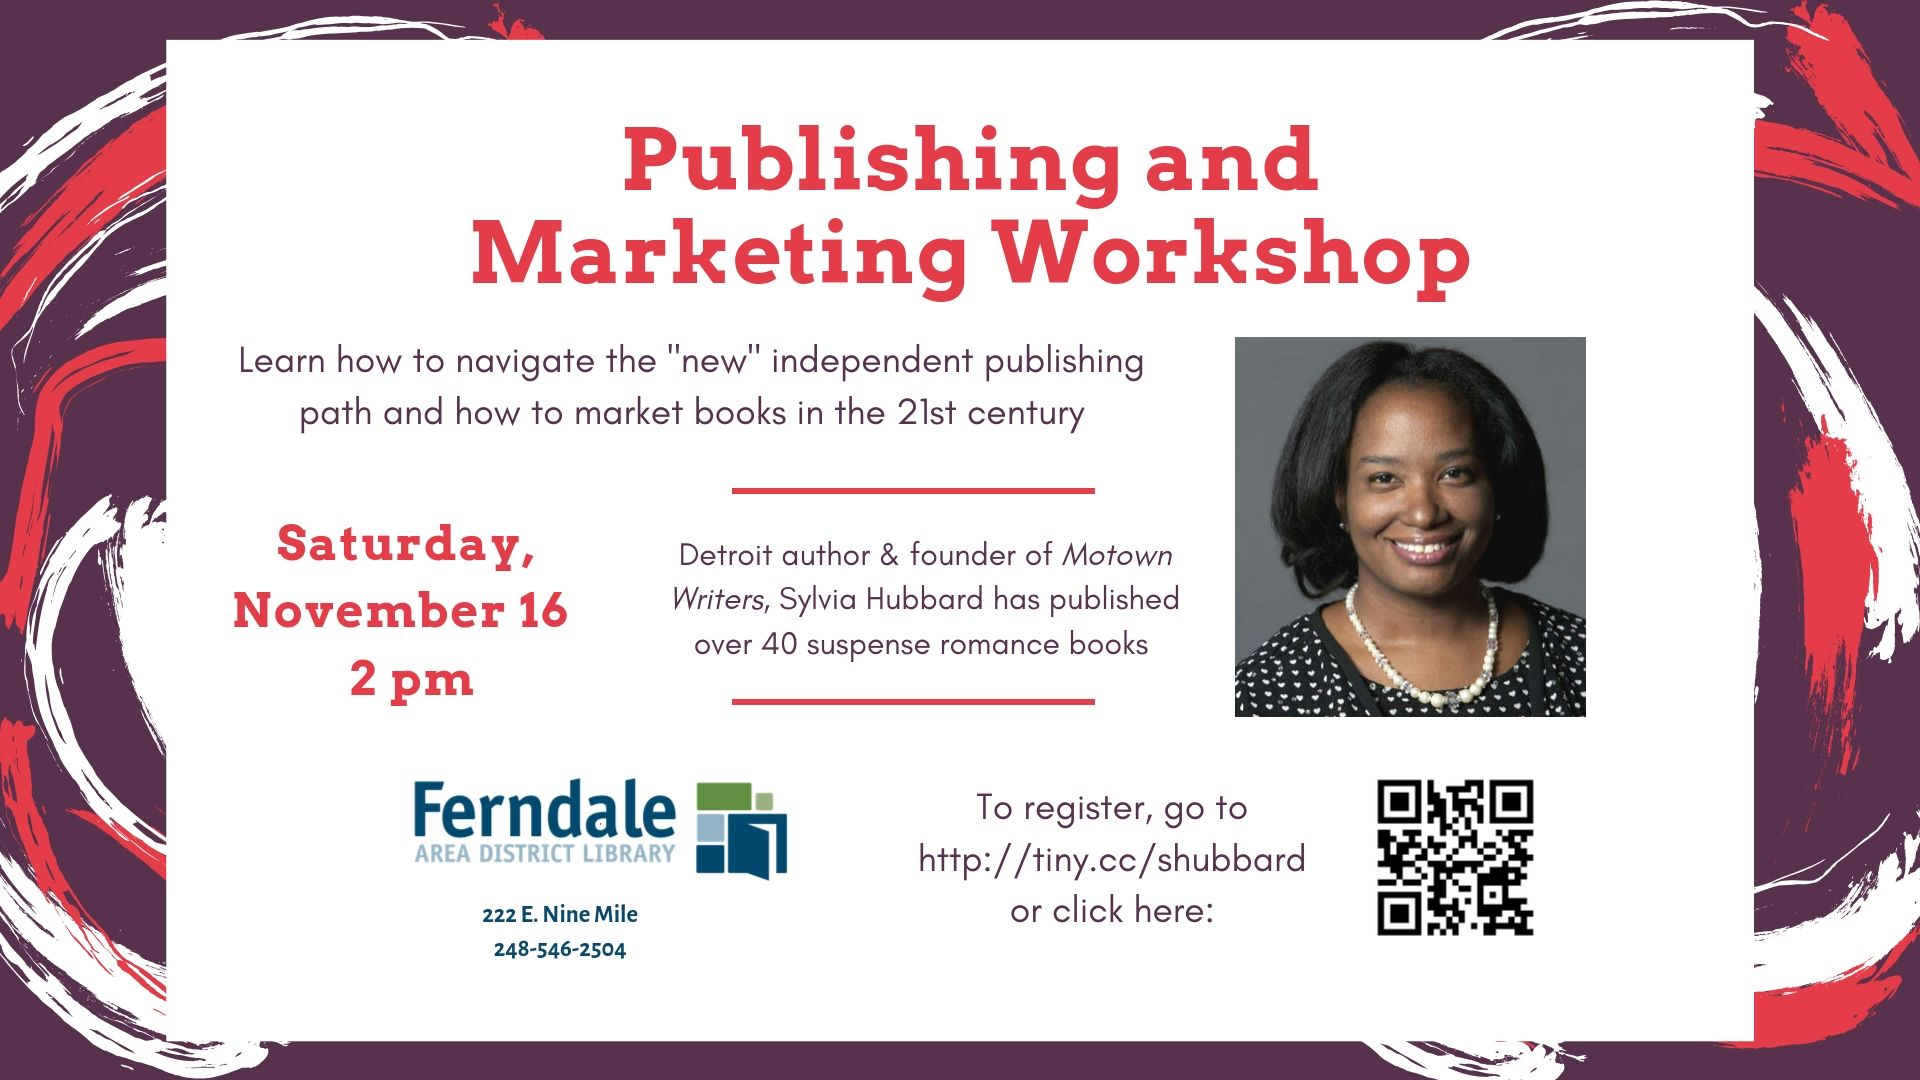 Publishing and Marketing Workshop with Sylvia Hubbard